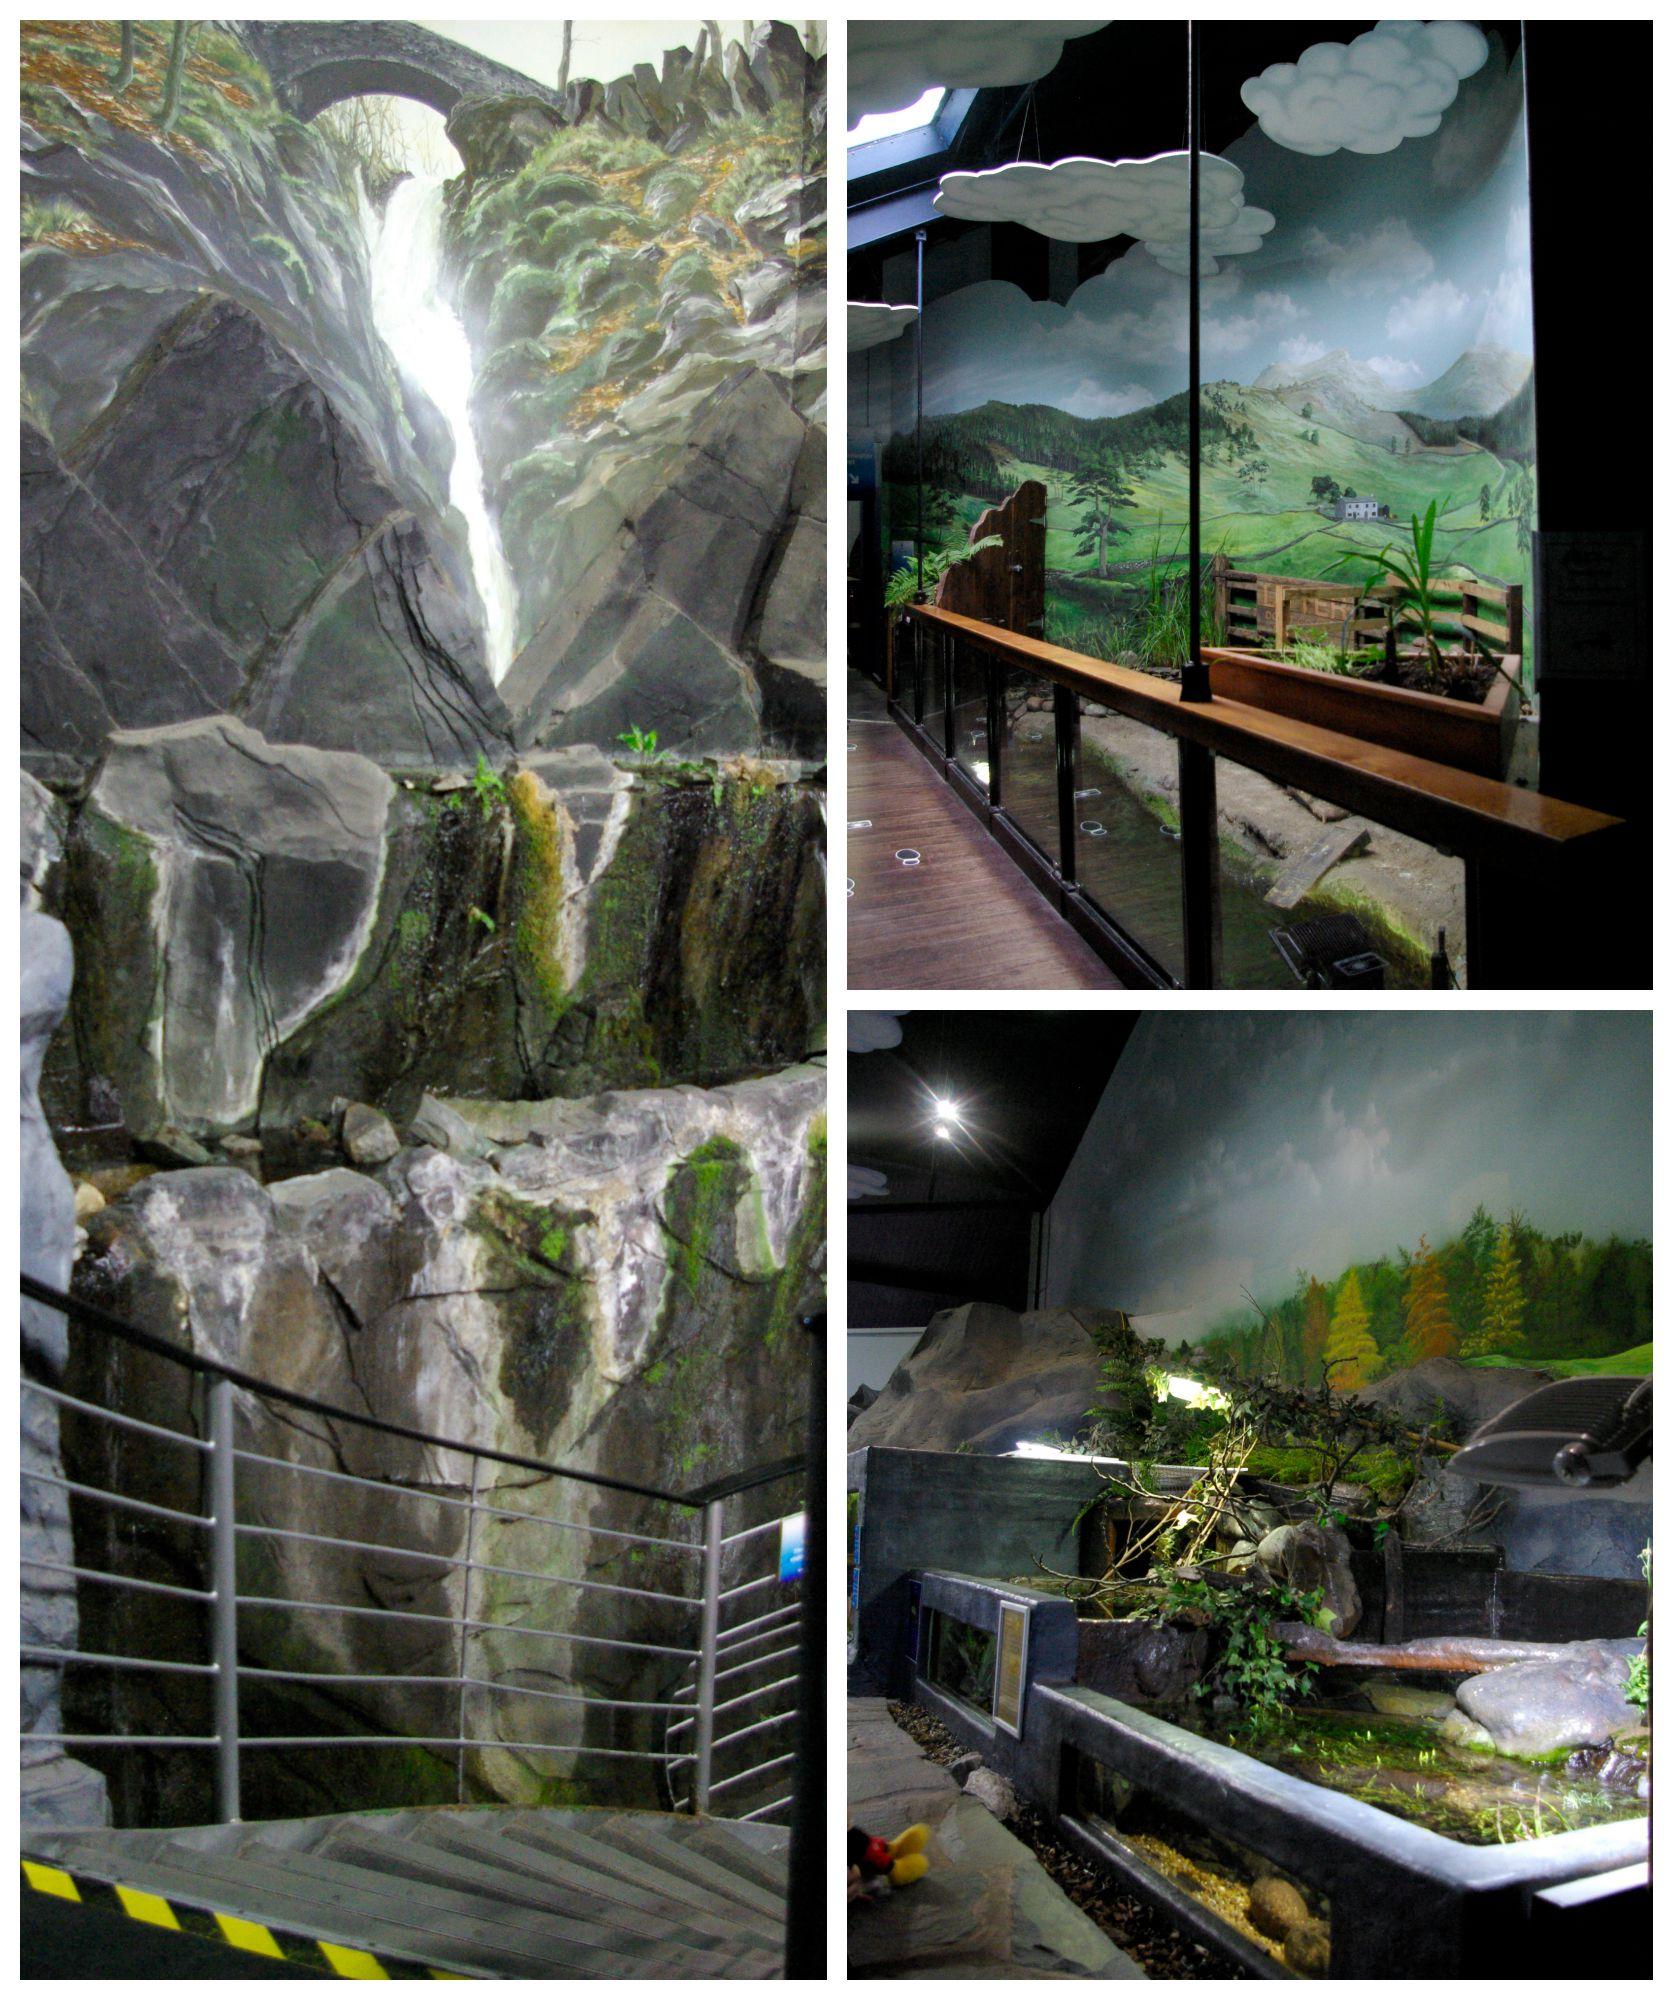 Lakes Aquarium, Newby Bridge, Cumbria - Kids Days Out Reviews